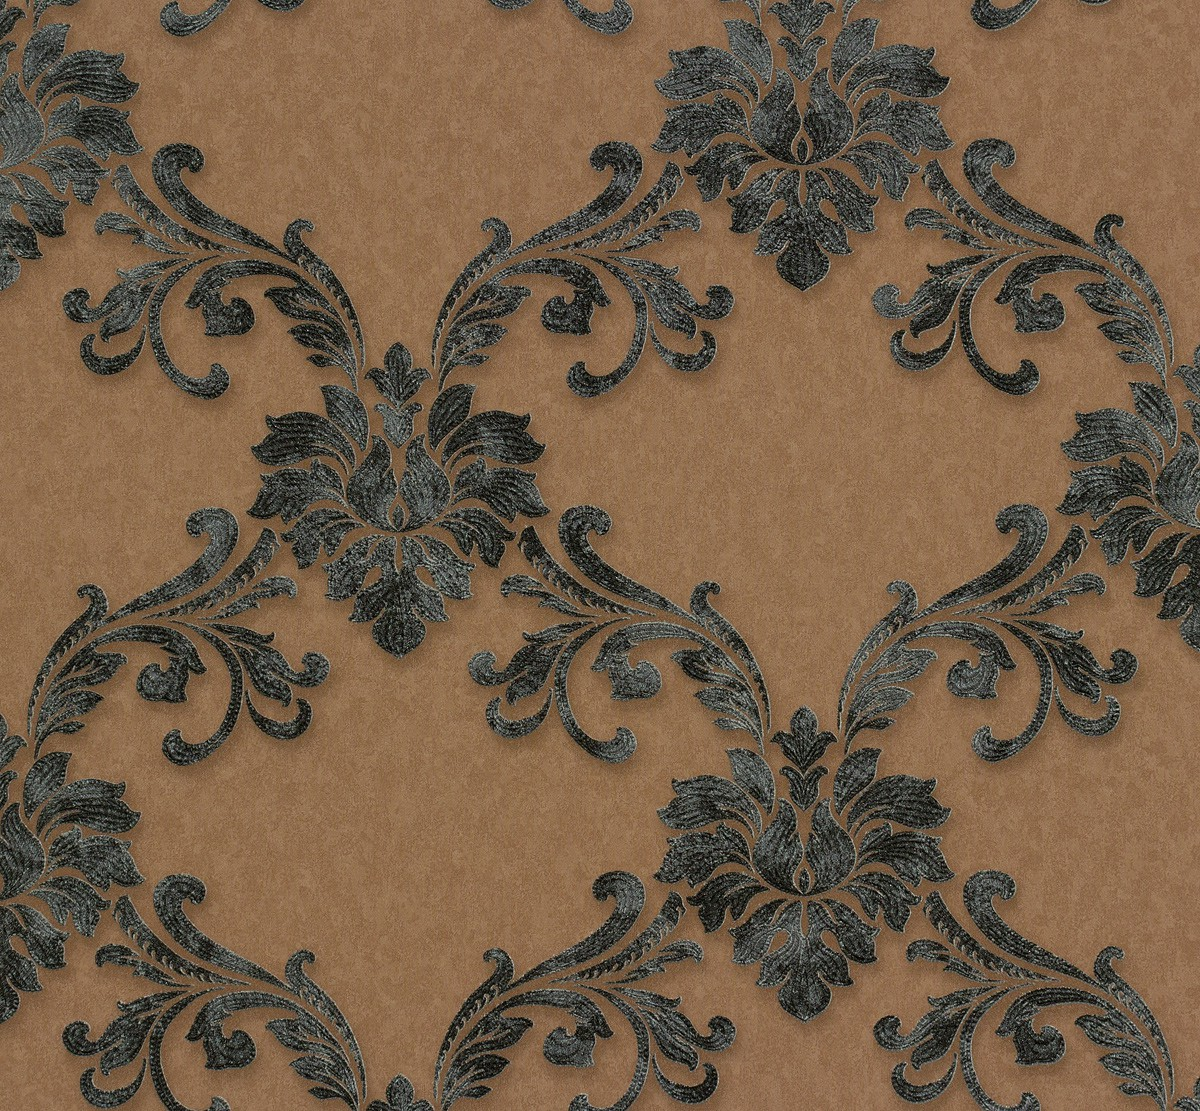 tapete erismann eterna vliestapete 5798 11 579811 barock. Black Bedroom Furniture Sets. Home Design Ideas